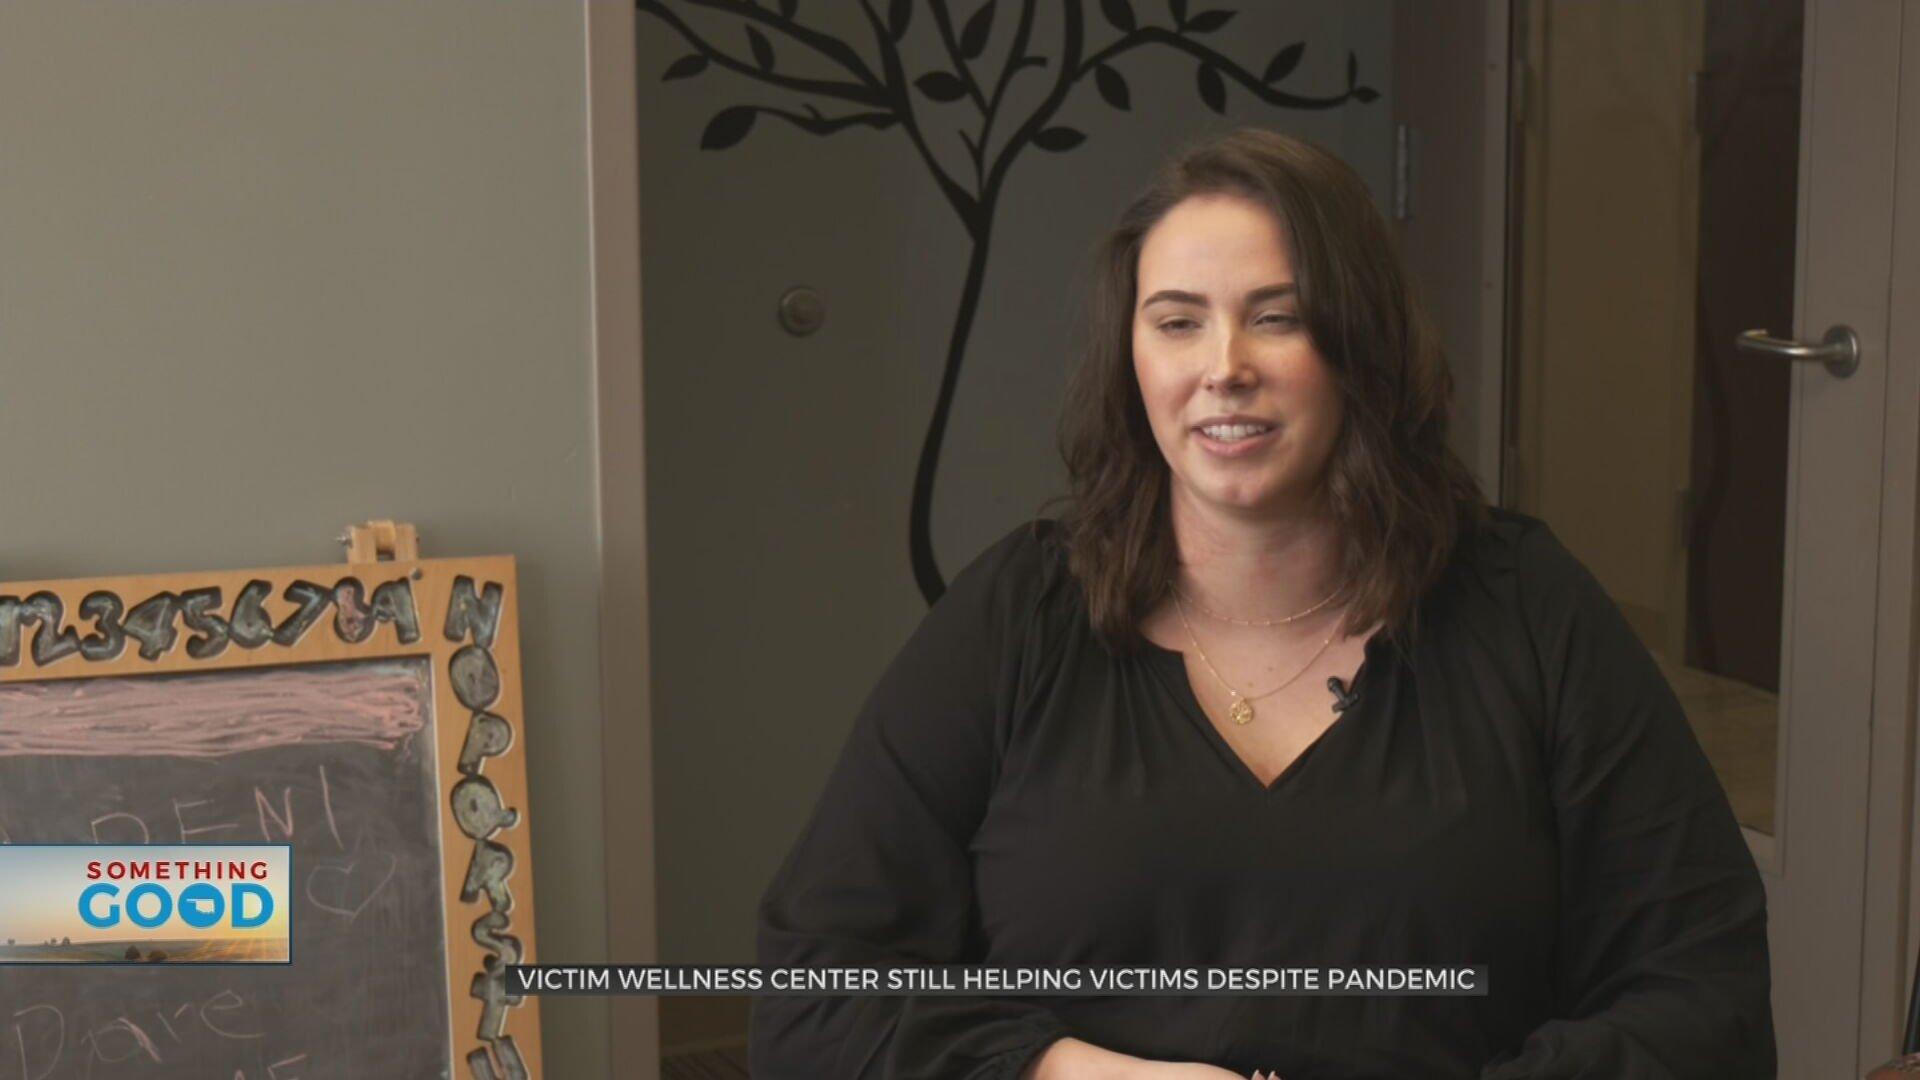 Tulsa Advocates Keep Standing Beside Victims Despite Pandemic